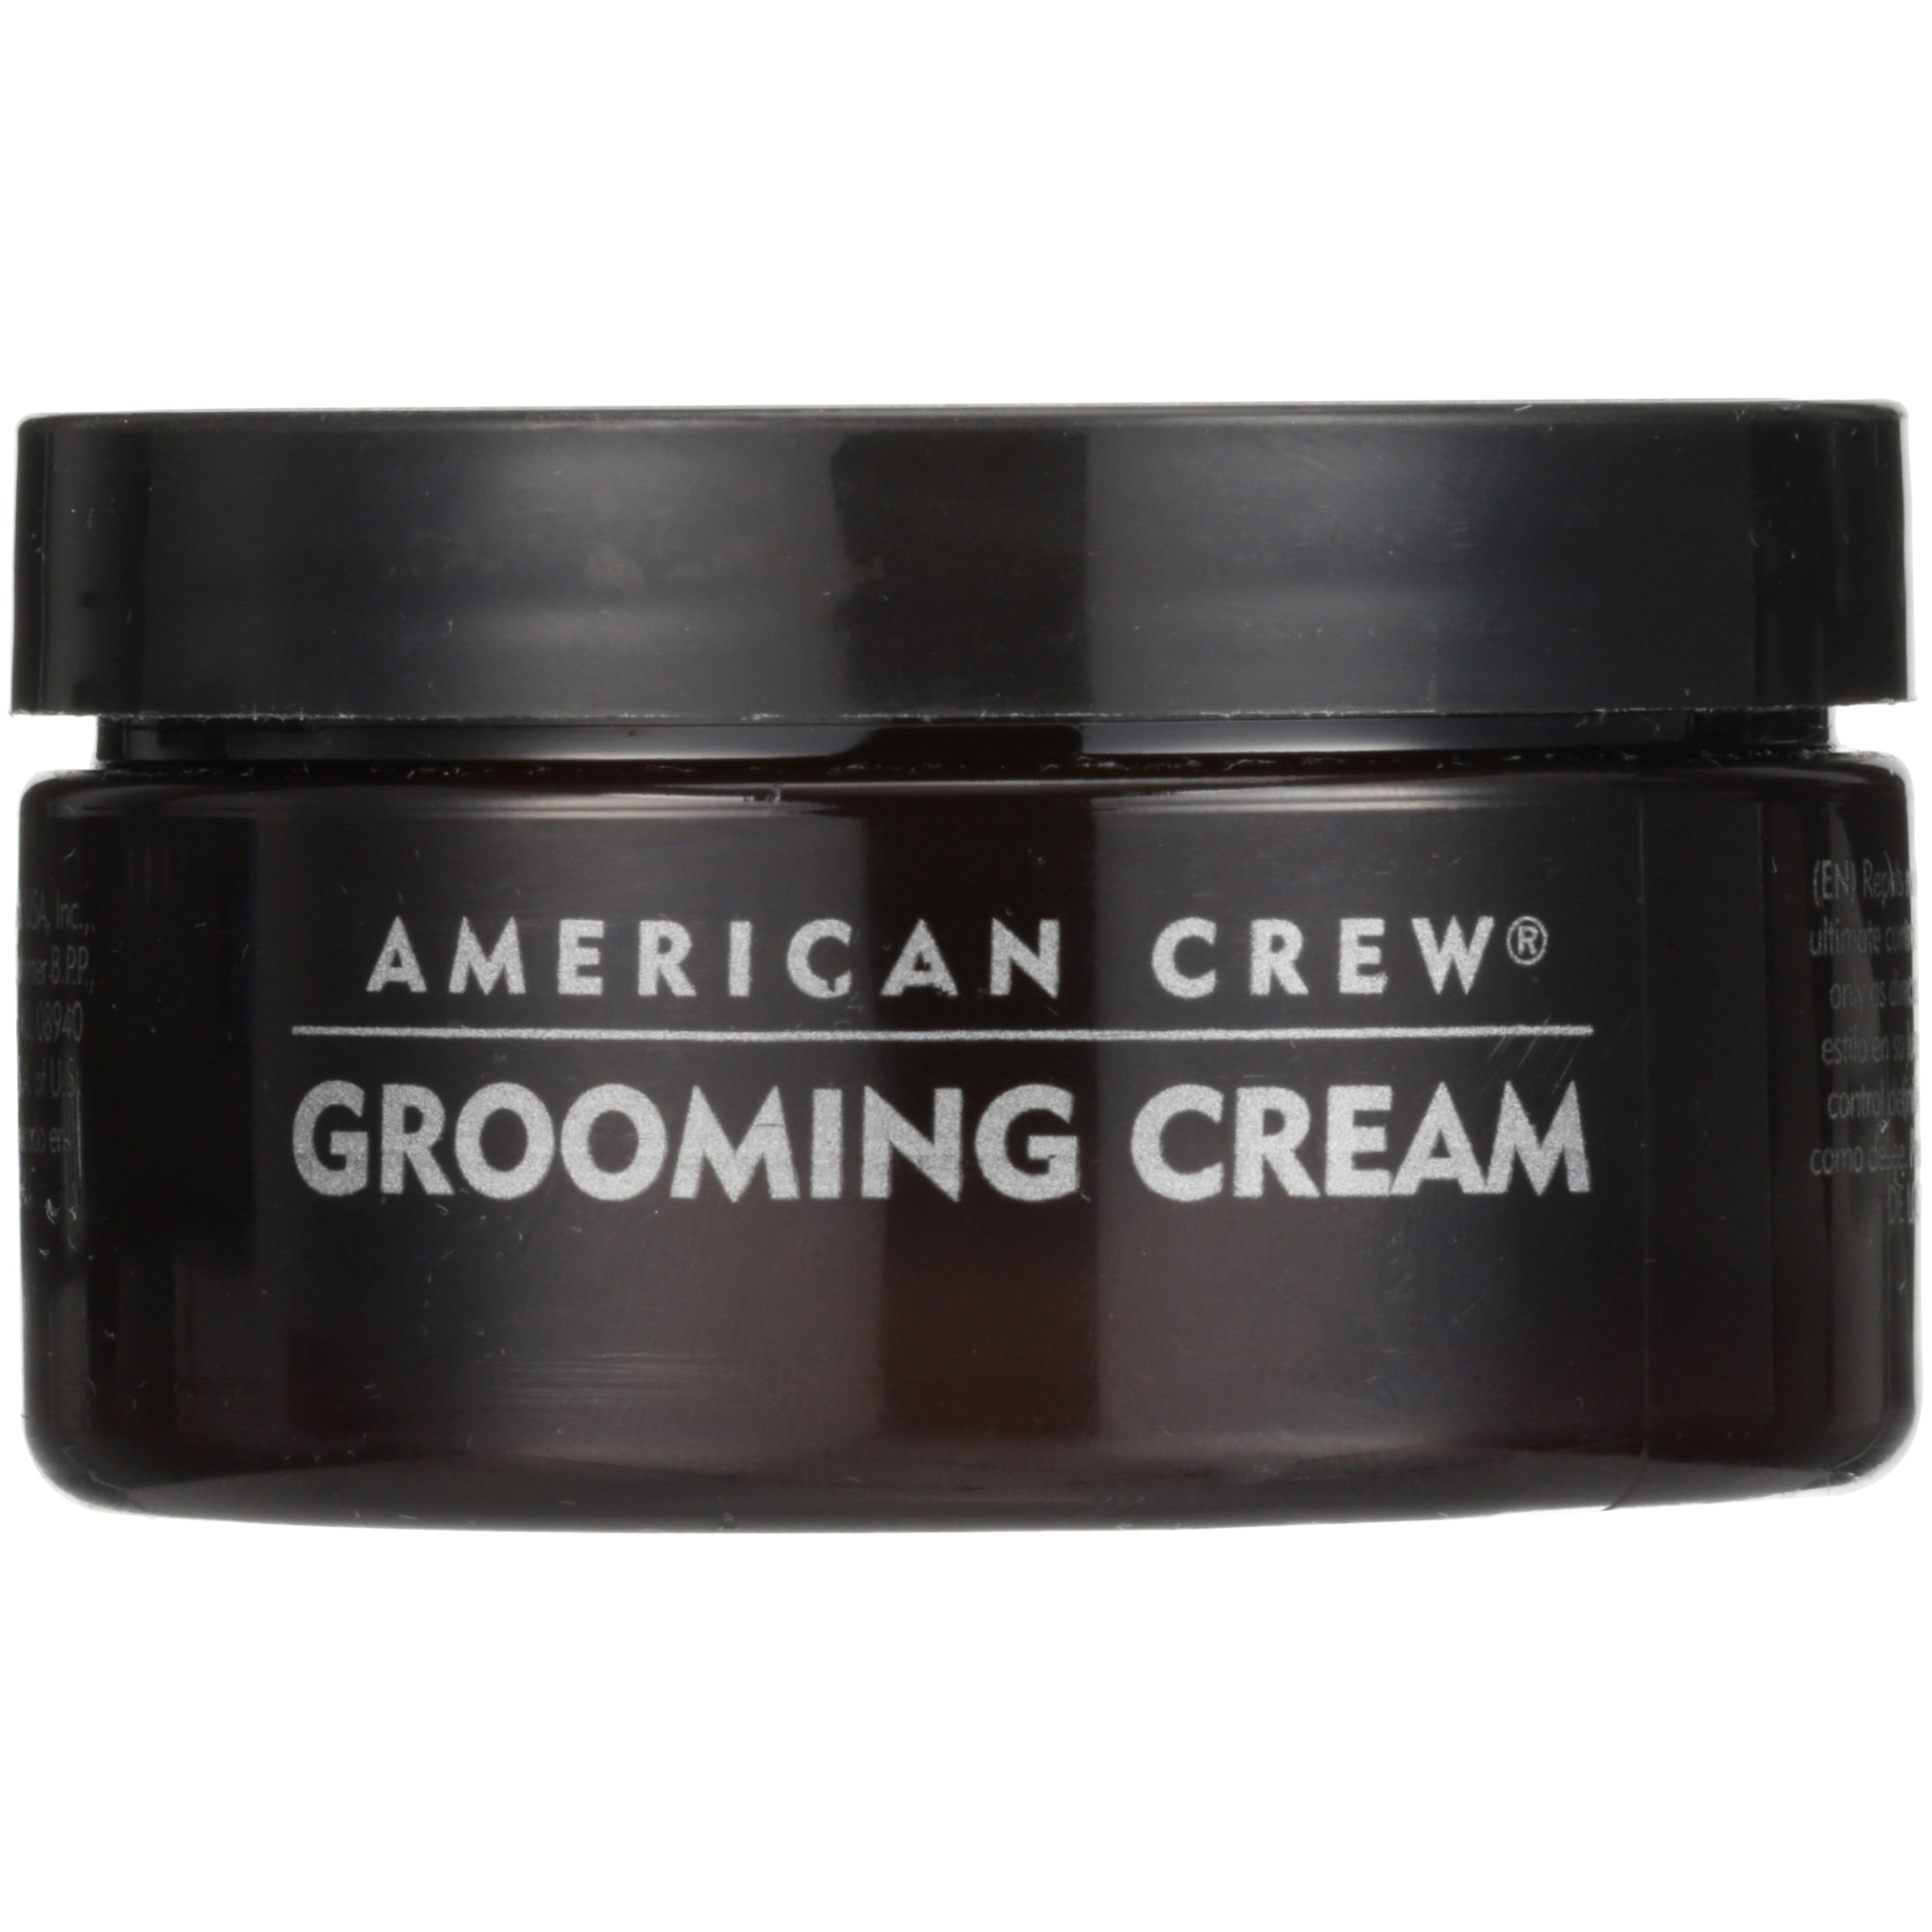 American Crew® Grooming Cream 3 oz. Tub